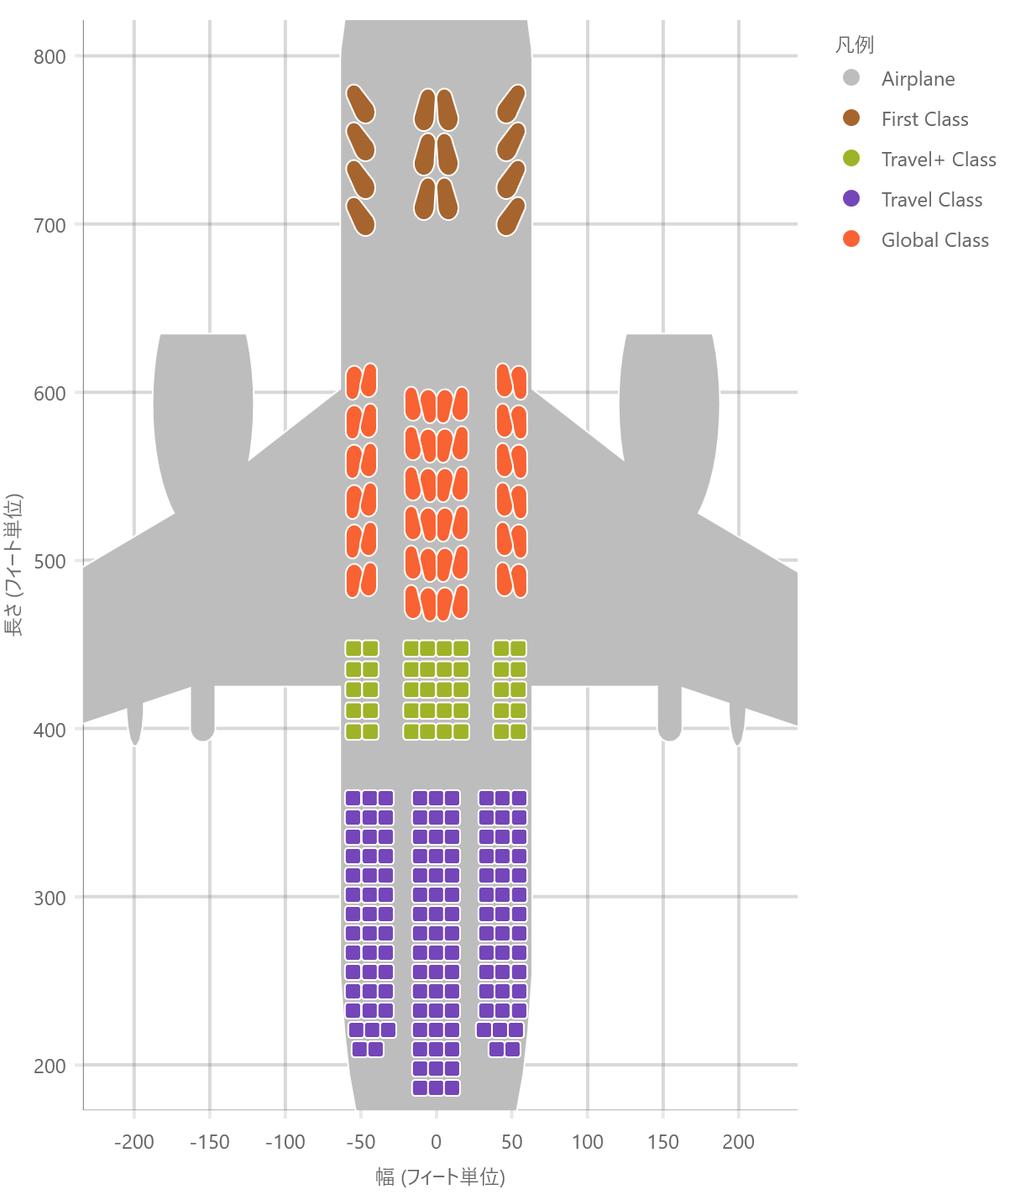 UIコントロール選択ガイド - チャート - シェープチャートを利用した座席表